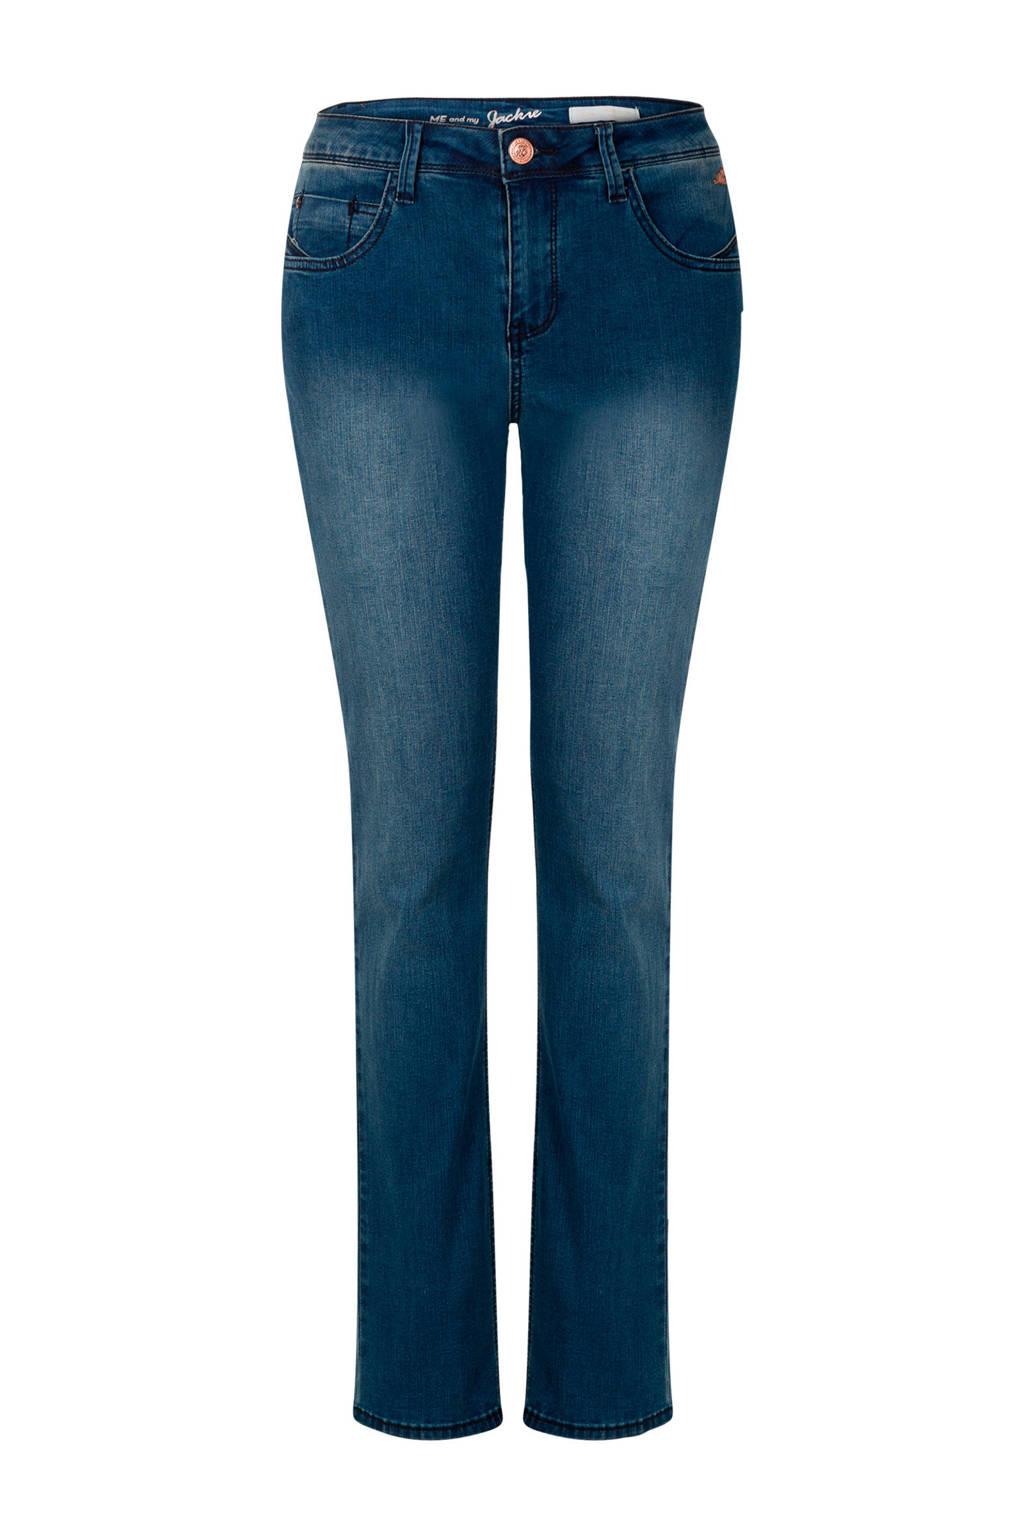 Miss Etam Regulier straight fit jeans Jackie 30 inch, Blauw